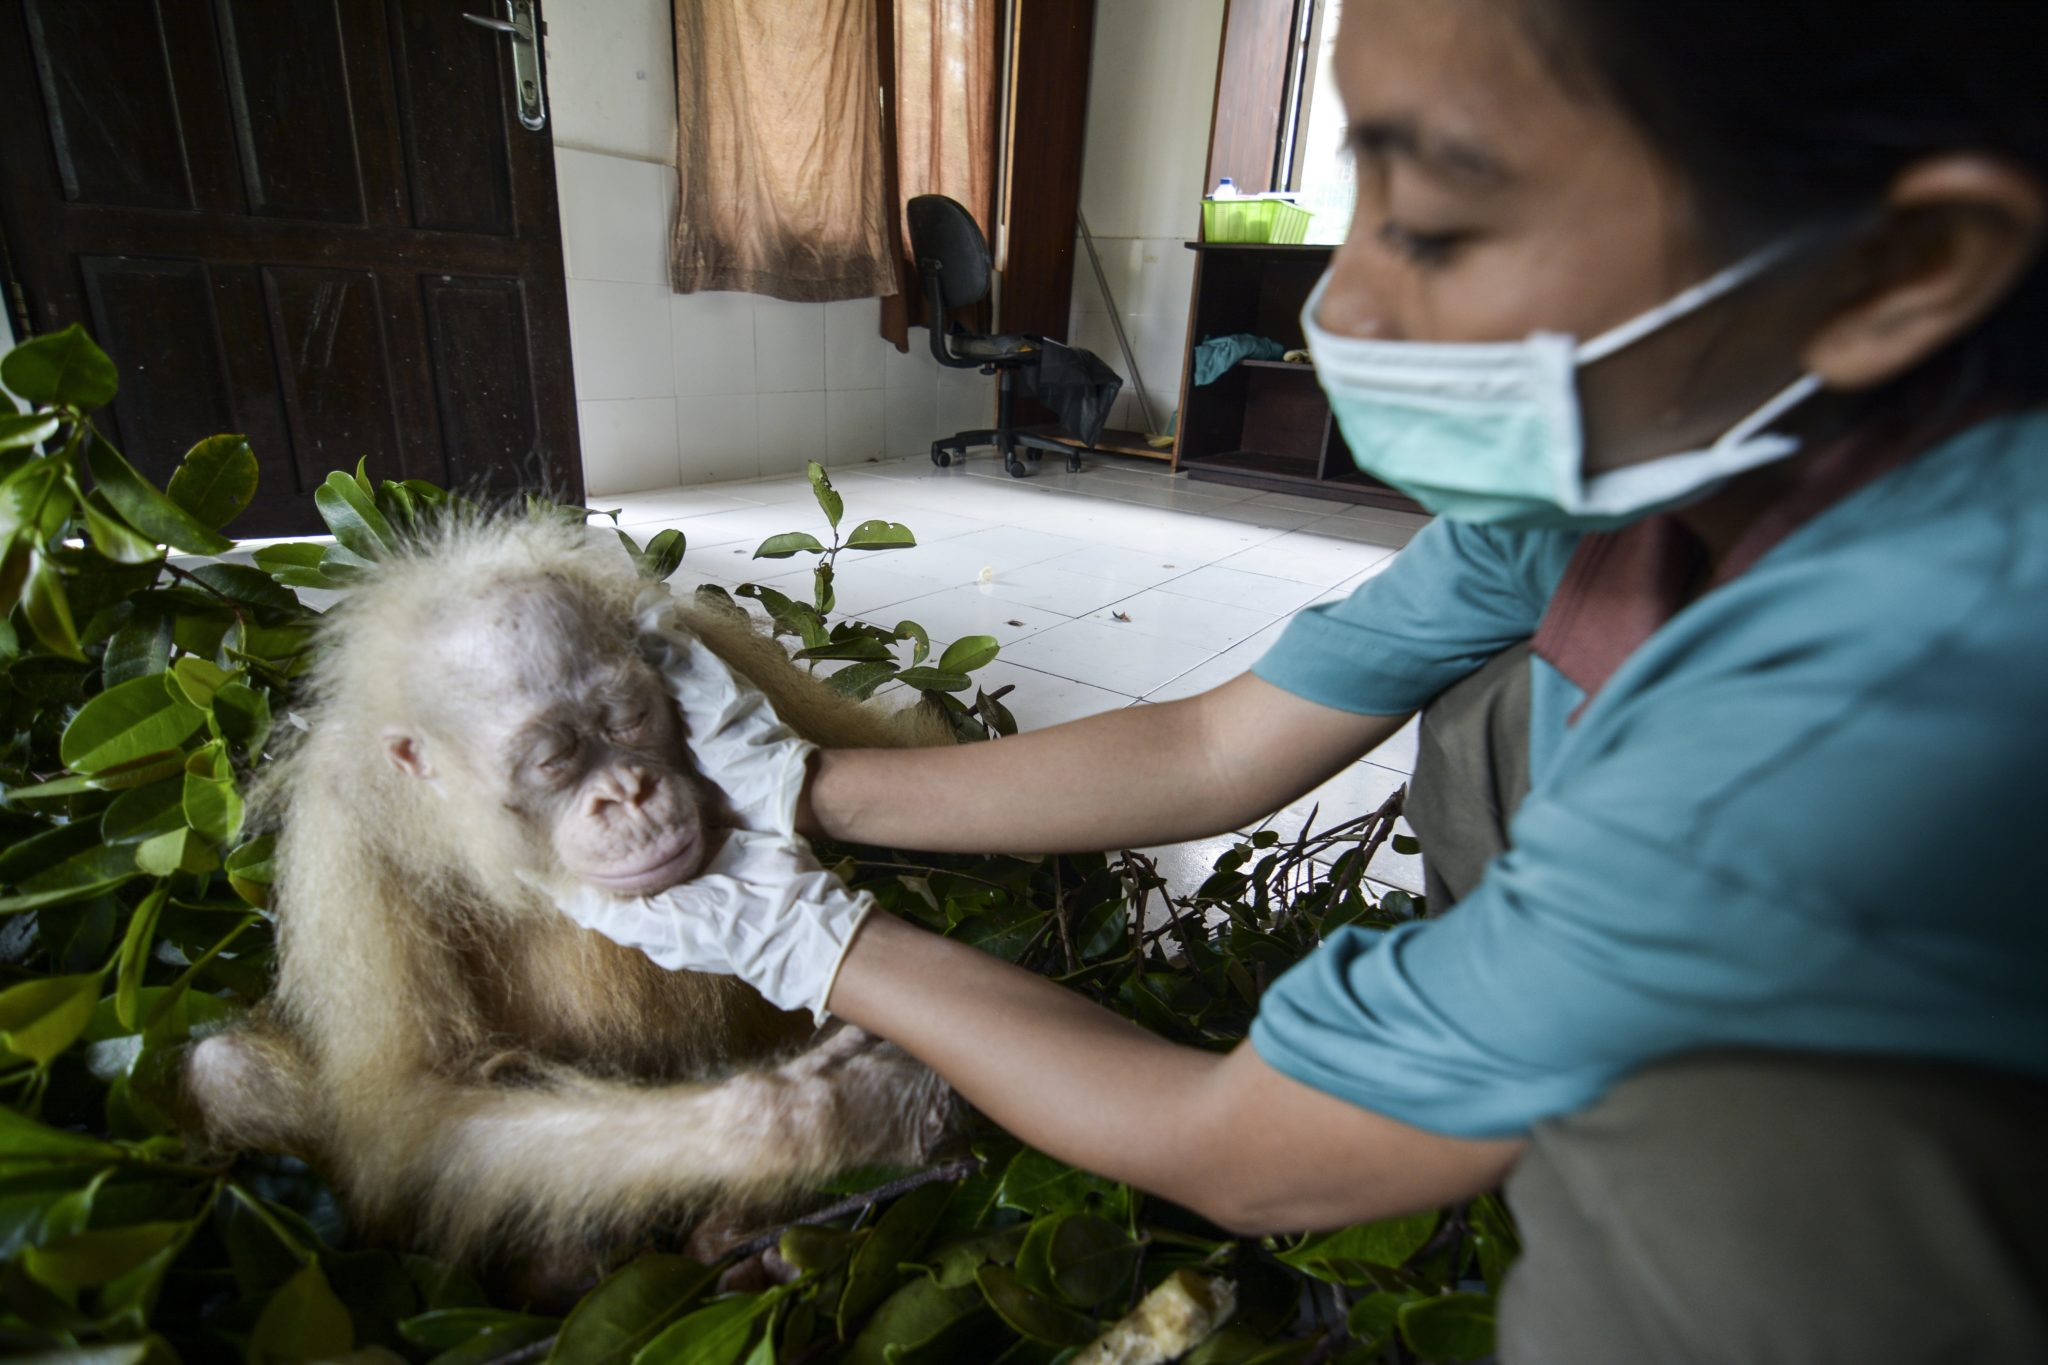 Indonezja: orangutan albinos w zoo Nyaru (foto. PaP/EPA/INDRAYANA / BOSF)